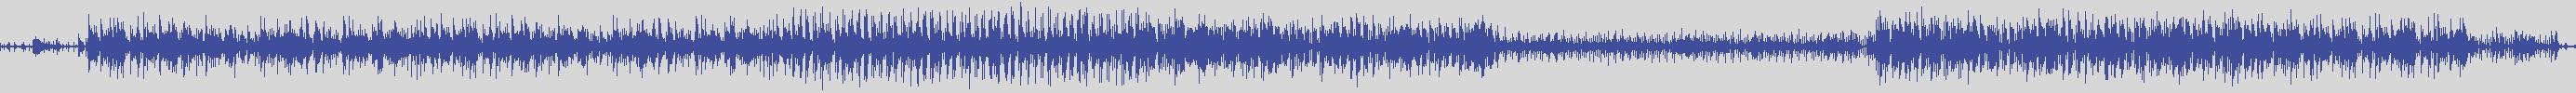 worldwide_music_records [WMR004] Counterweight - Through the Snow [Original Mix] audio wave form